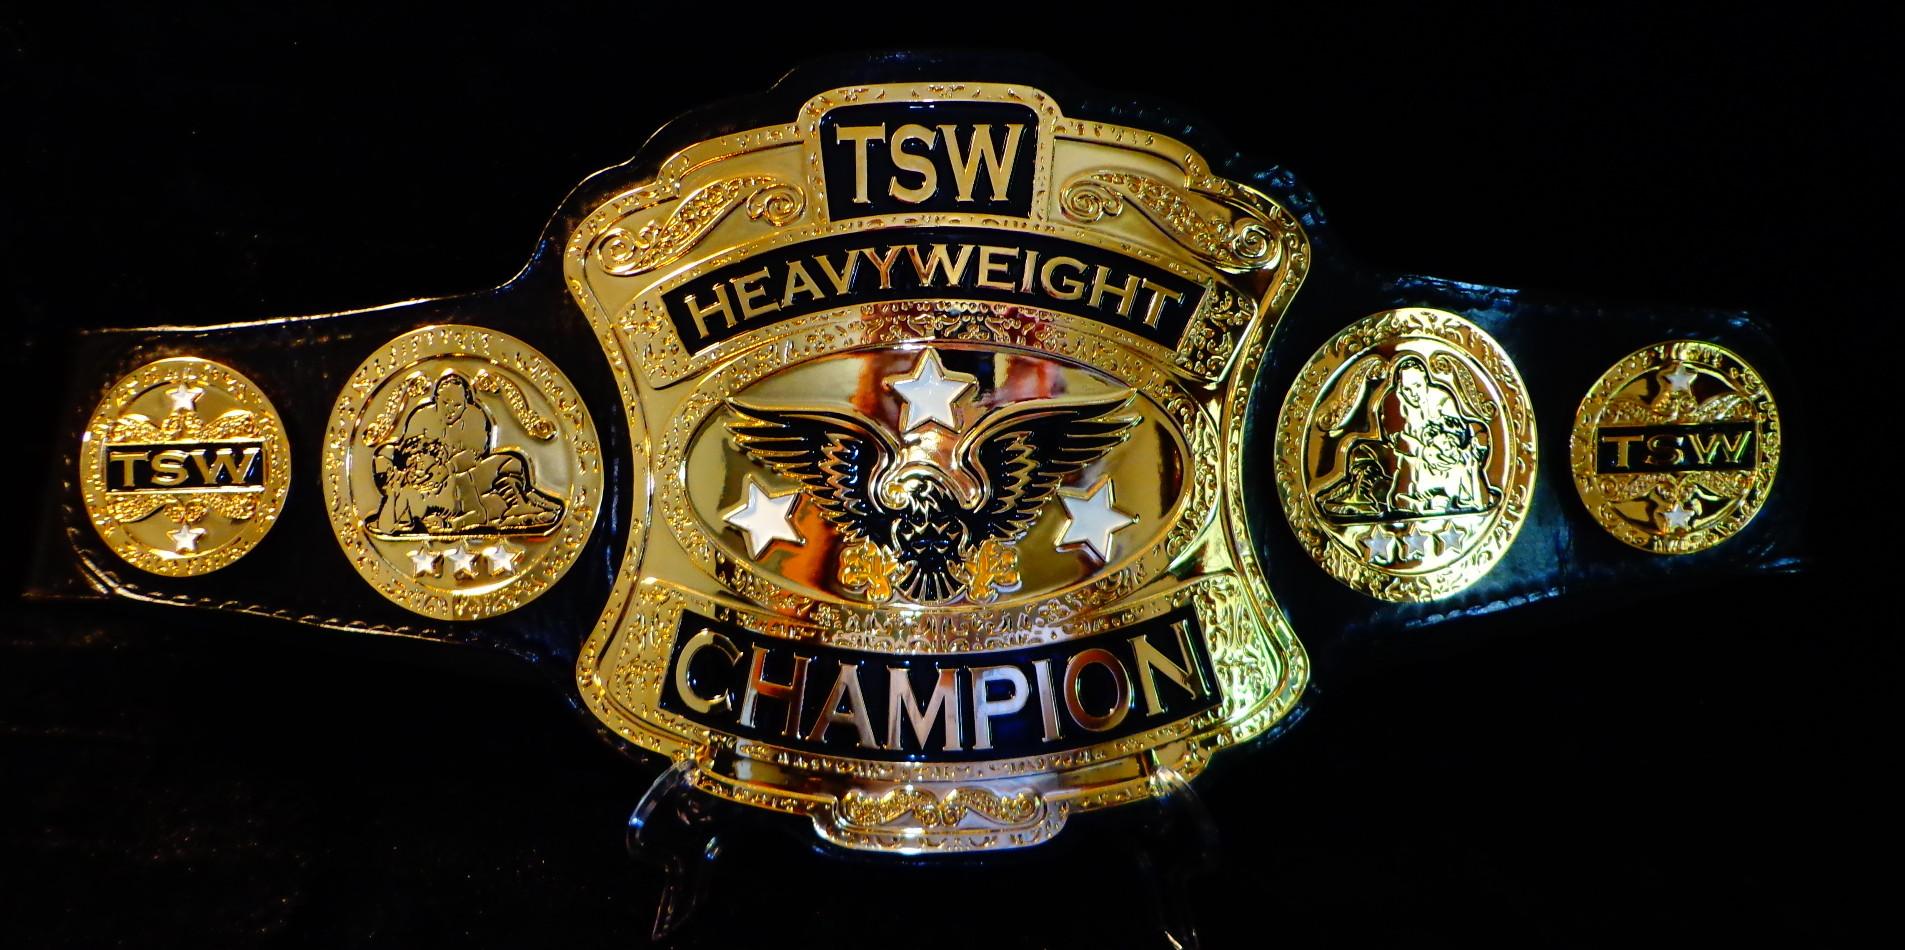 TSW CHAMPIONSHIP BELT